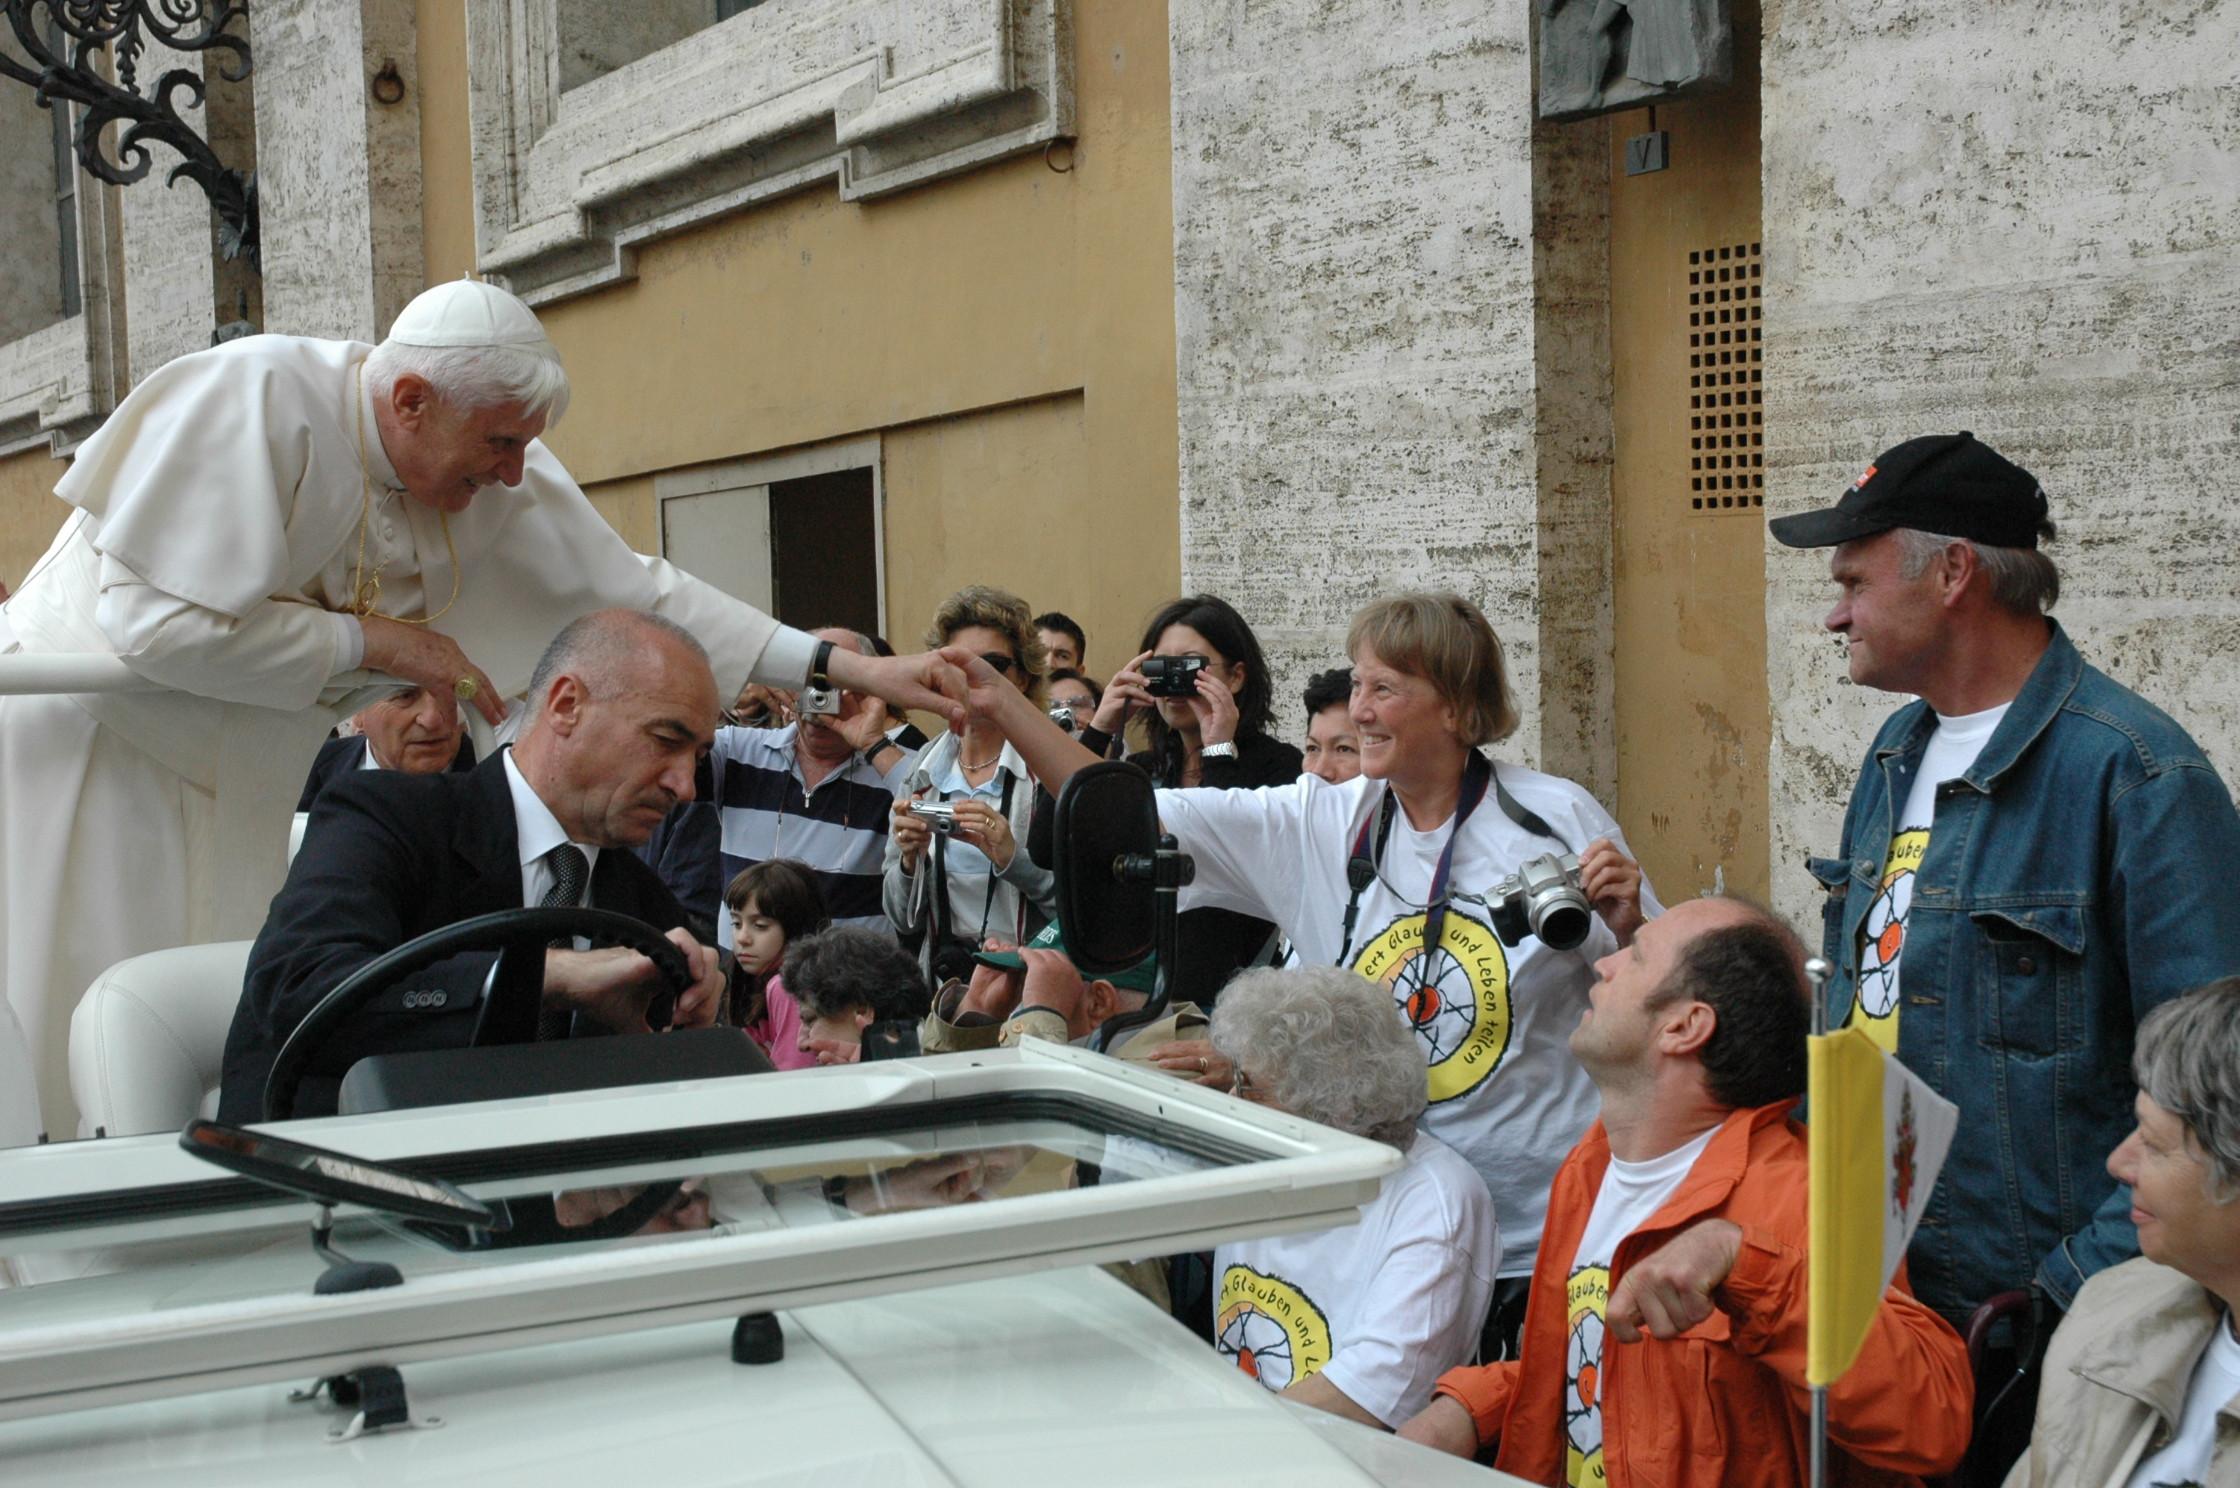 Kurze Begegnung einiger Teilnehmer unserer Romwallfahrt am Mittwoch, 5. Oktober 2005 mit dem Papst